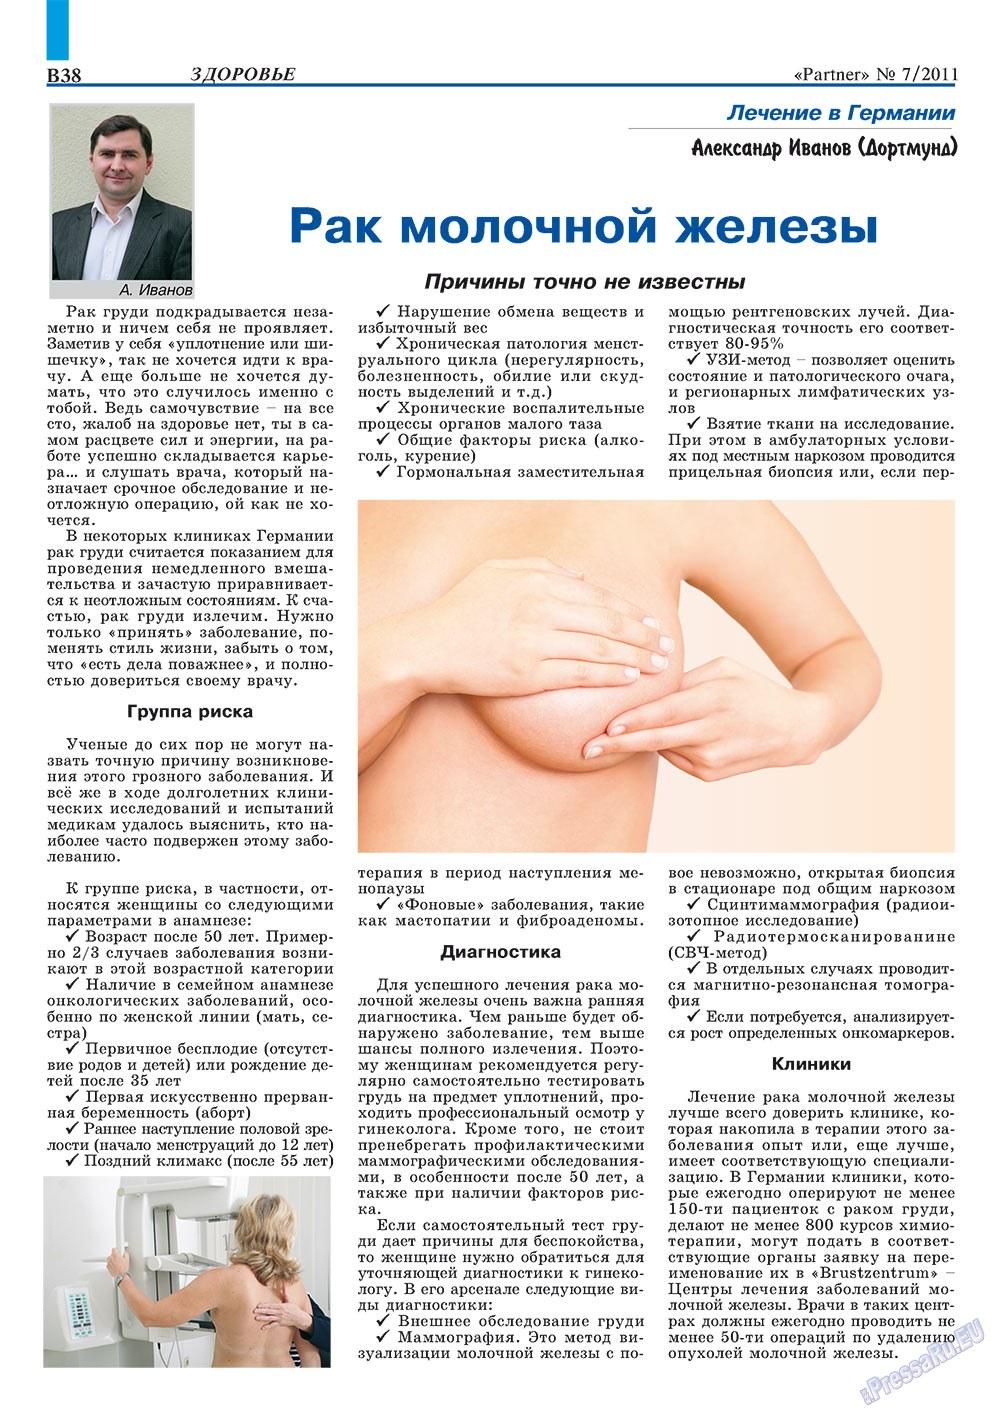 Партнер-север (журнал). 2011 год, номер 7, стр. 48